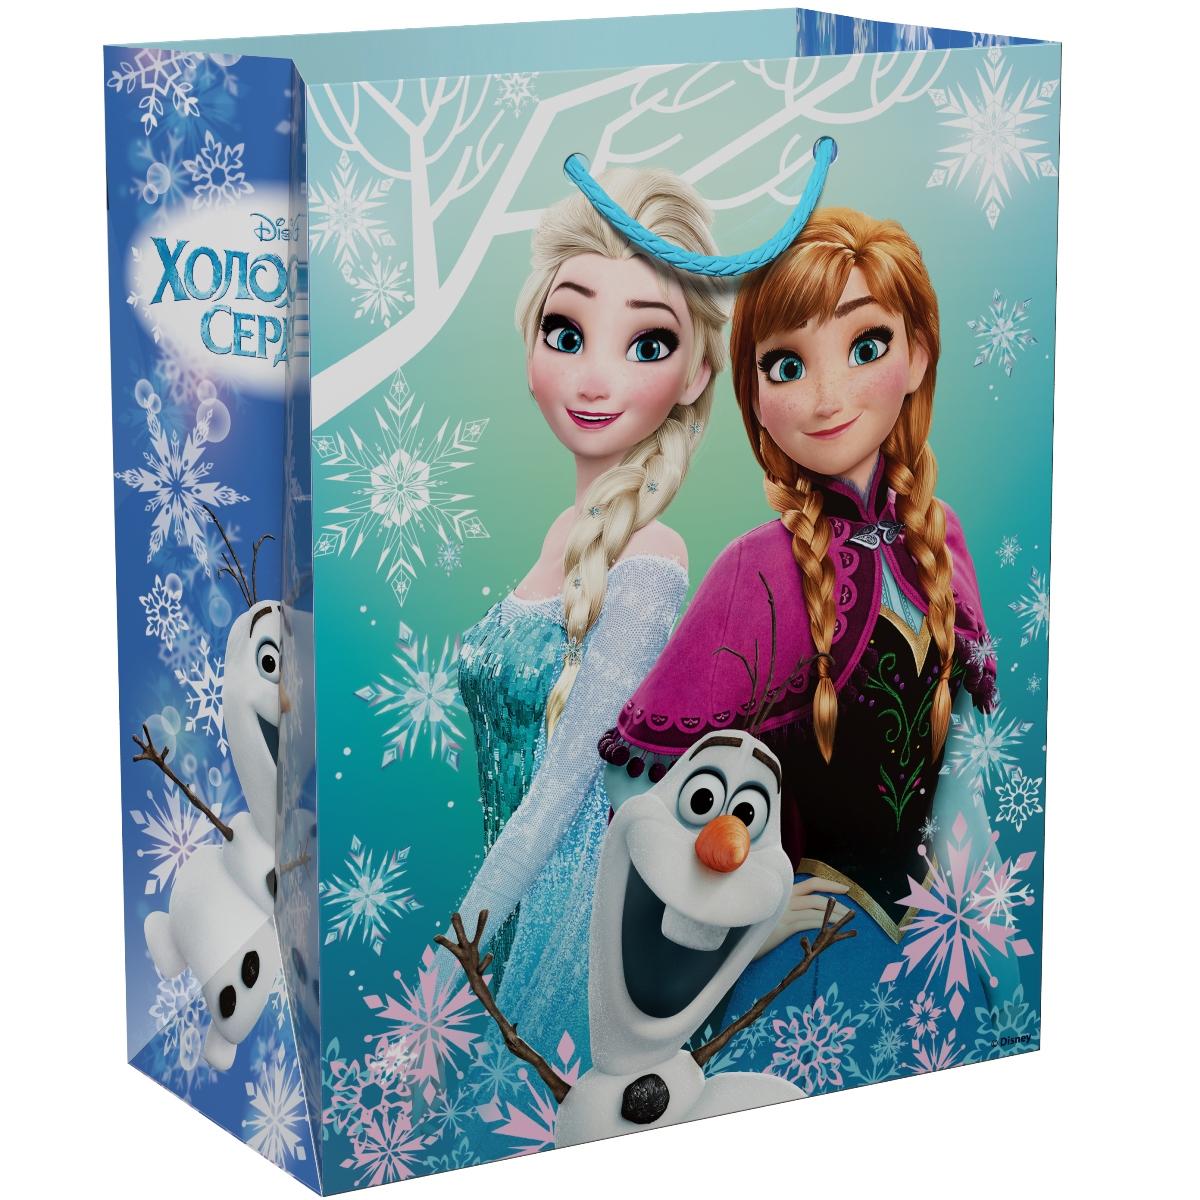 Disney Холодное Сердце Пакет подарочный 23 х 18 х 10 см -  Подарочная упаковка